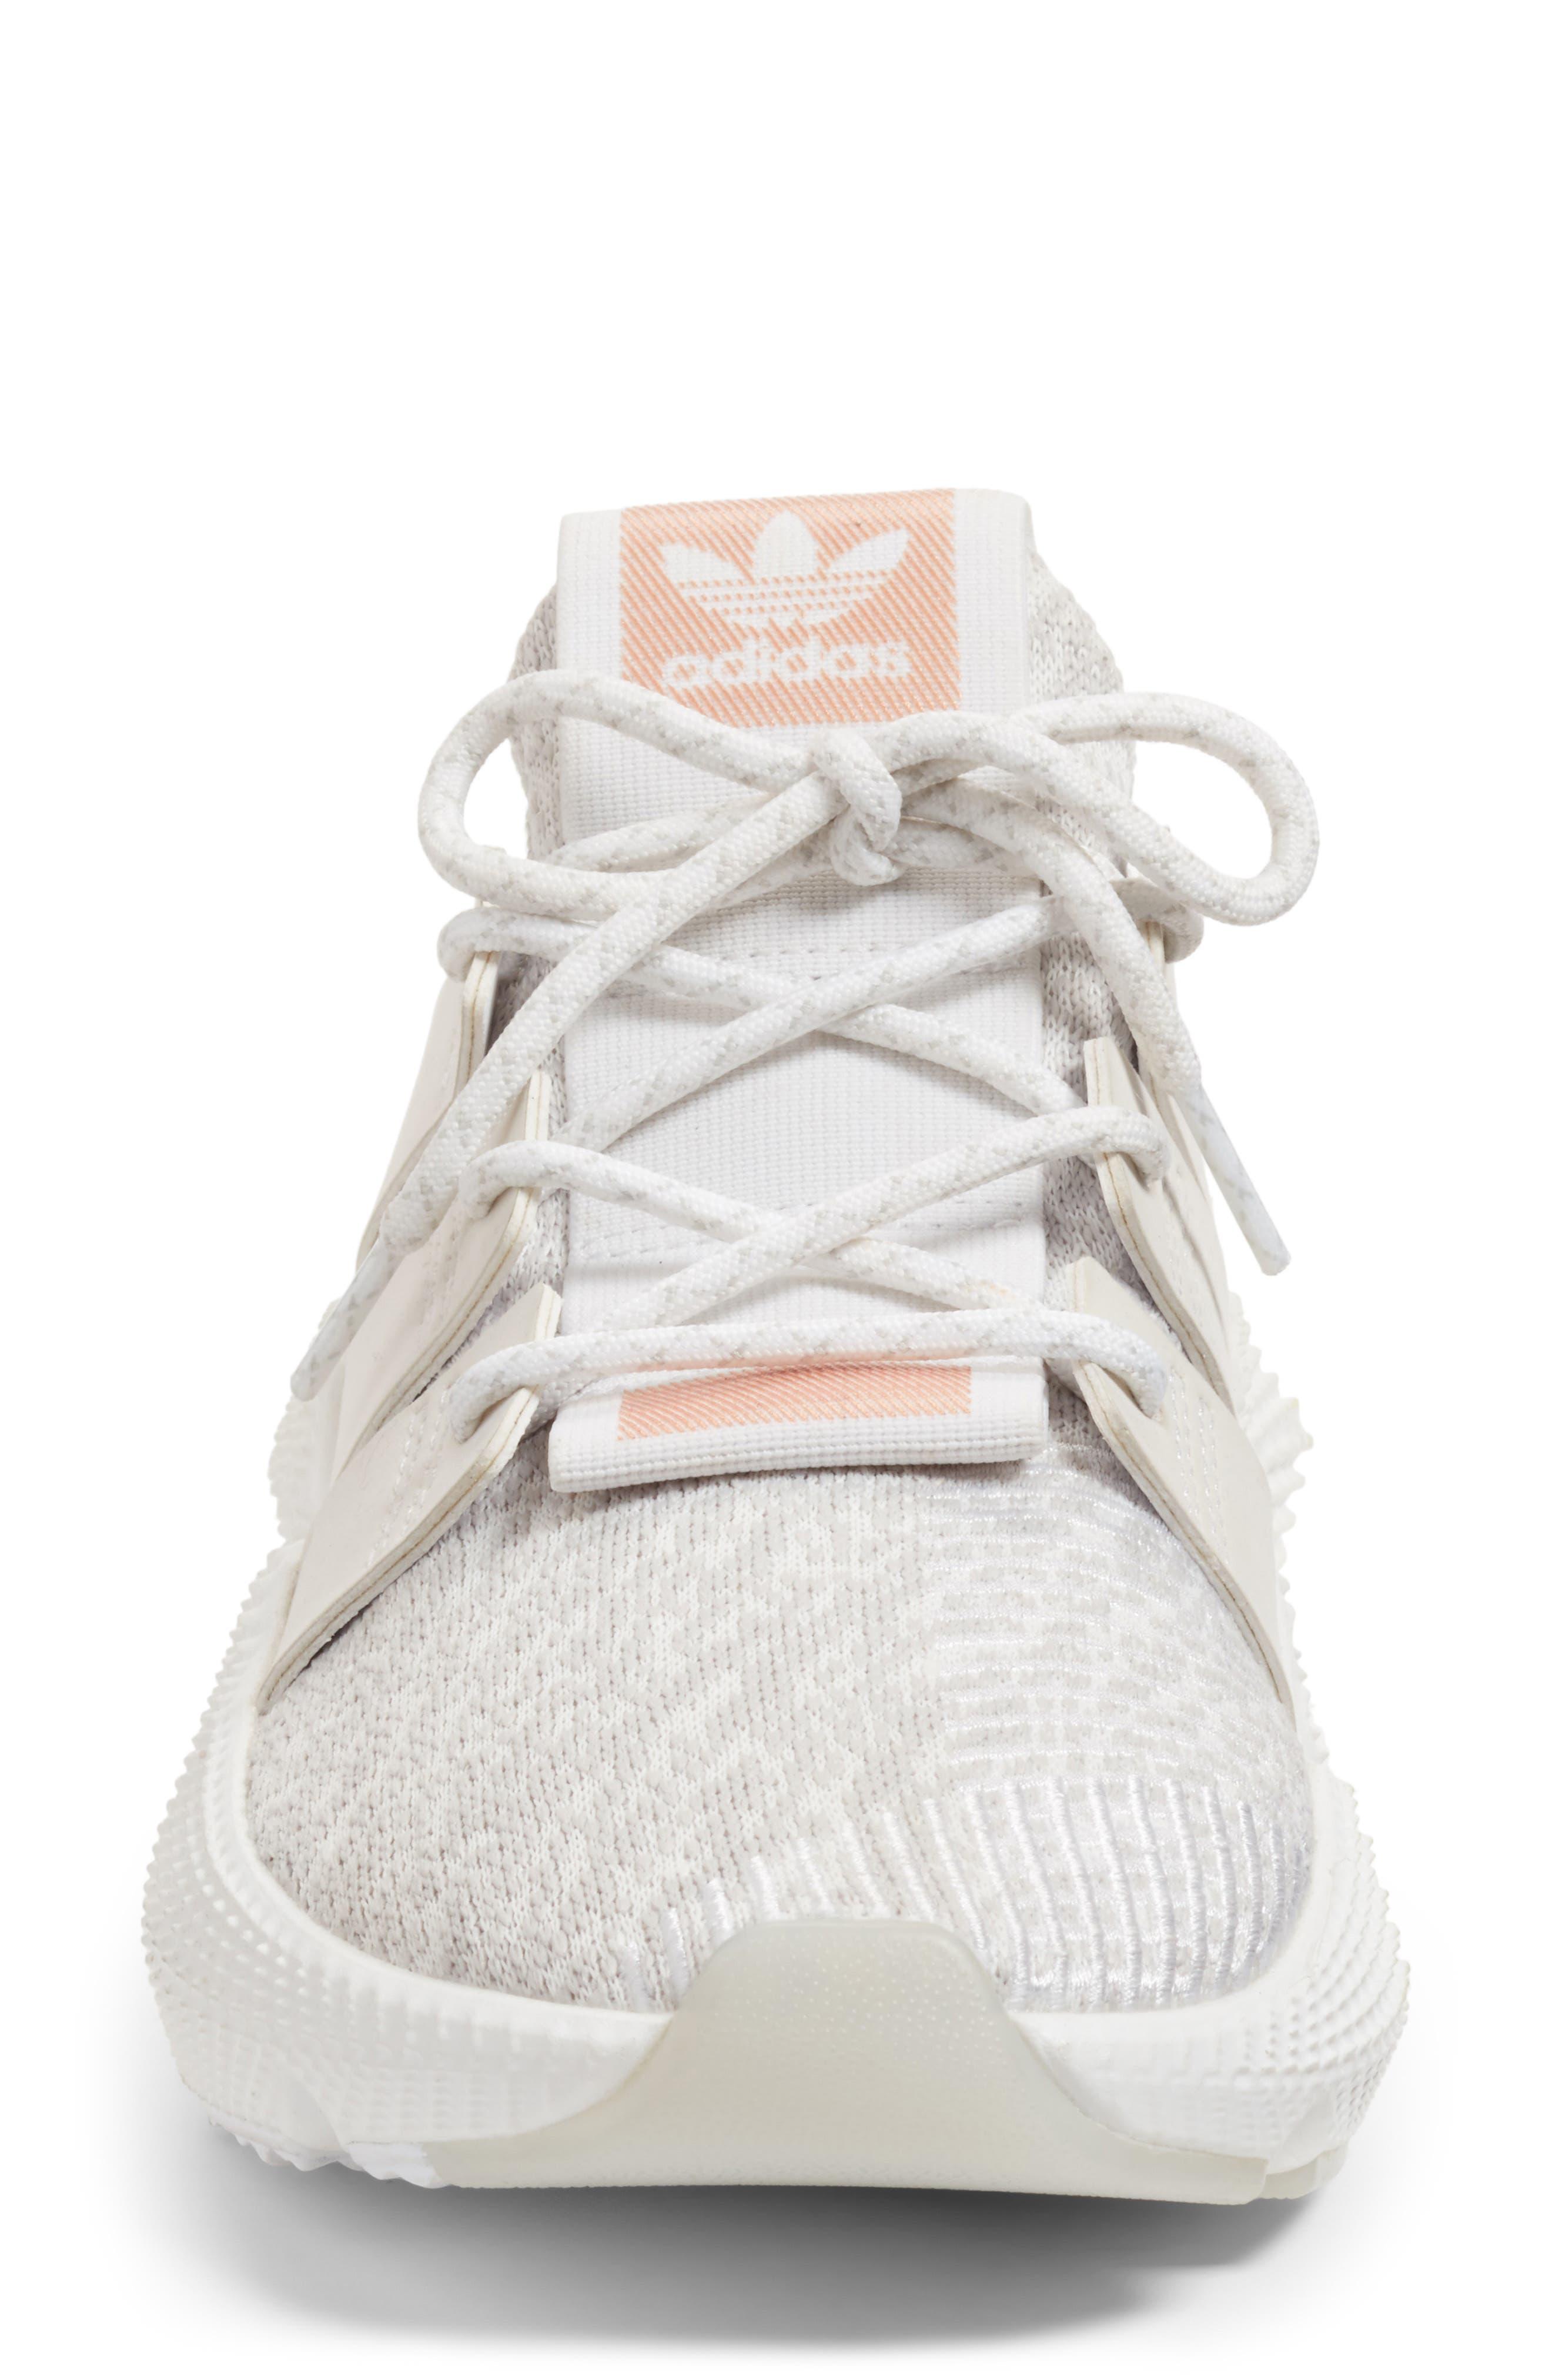 Prophere Sneaker,                             Alternate thumbnail 4, color,                             White/ White/ Supplier Colour